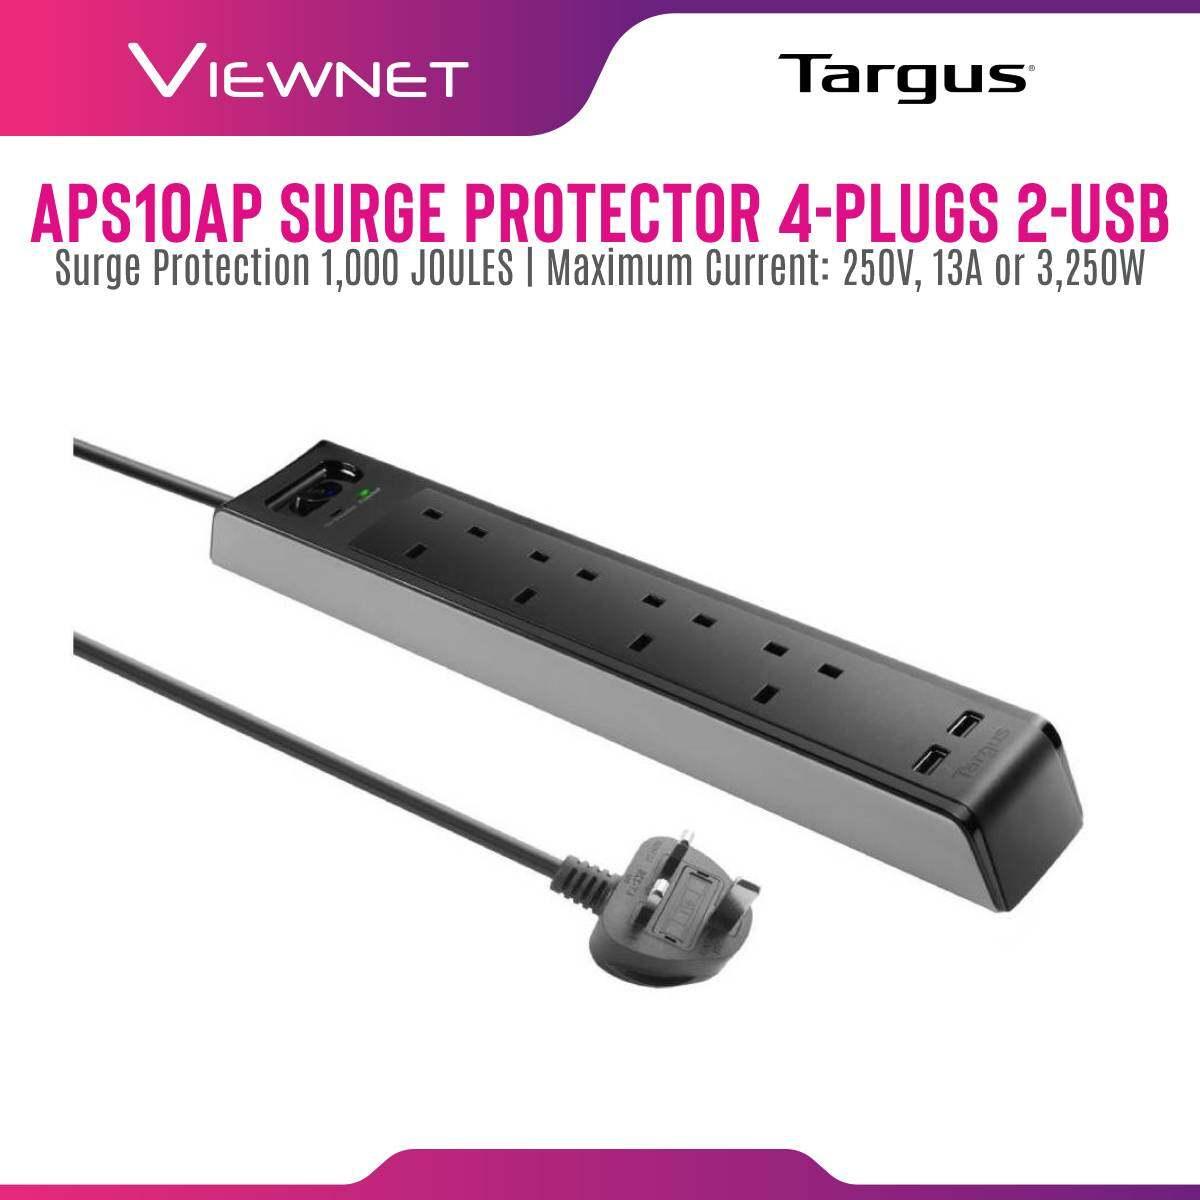 TARGUS SURGE PROTECTOR 4-PLUGS WITH 2-USB 2M (APS10AP-50)